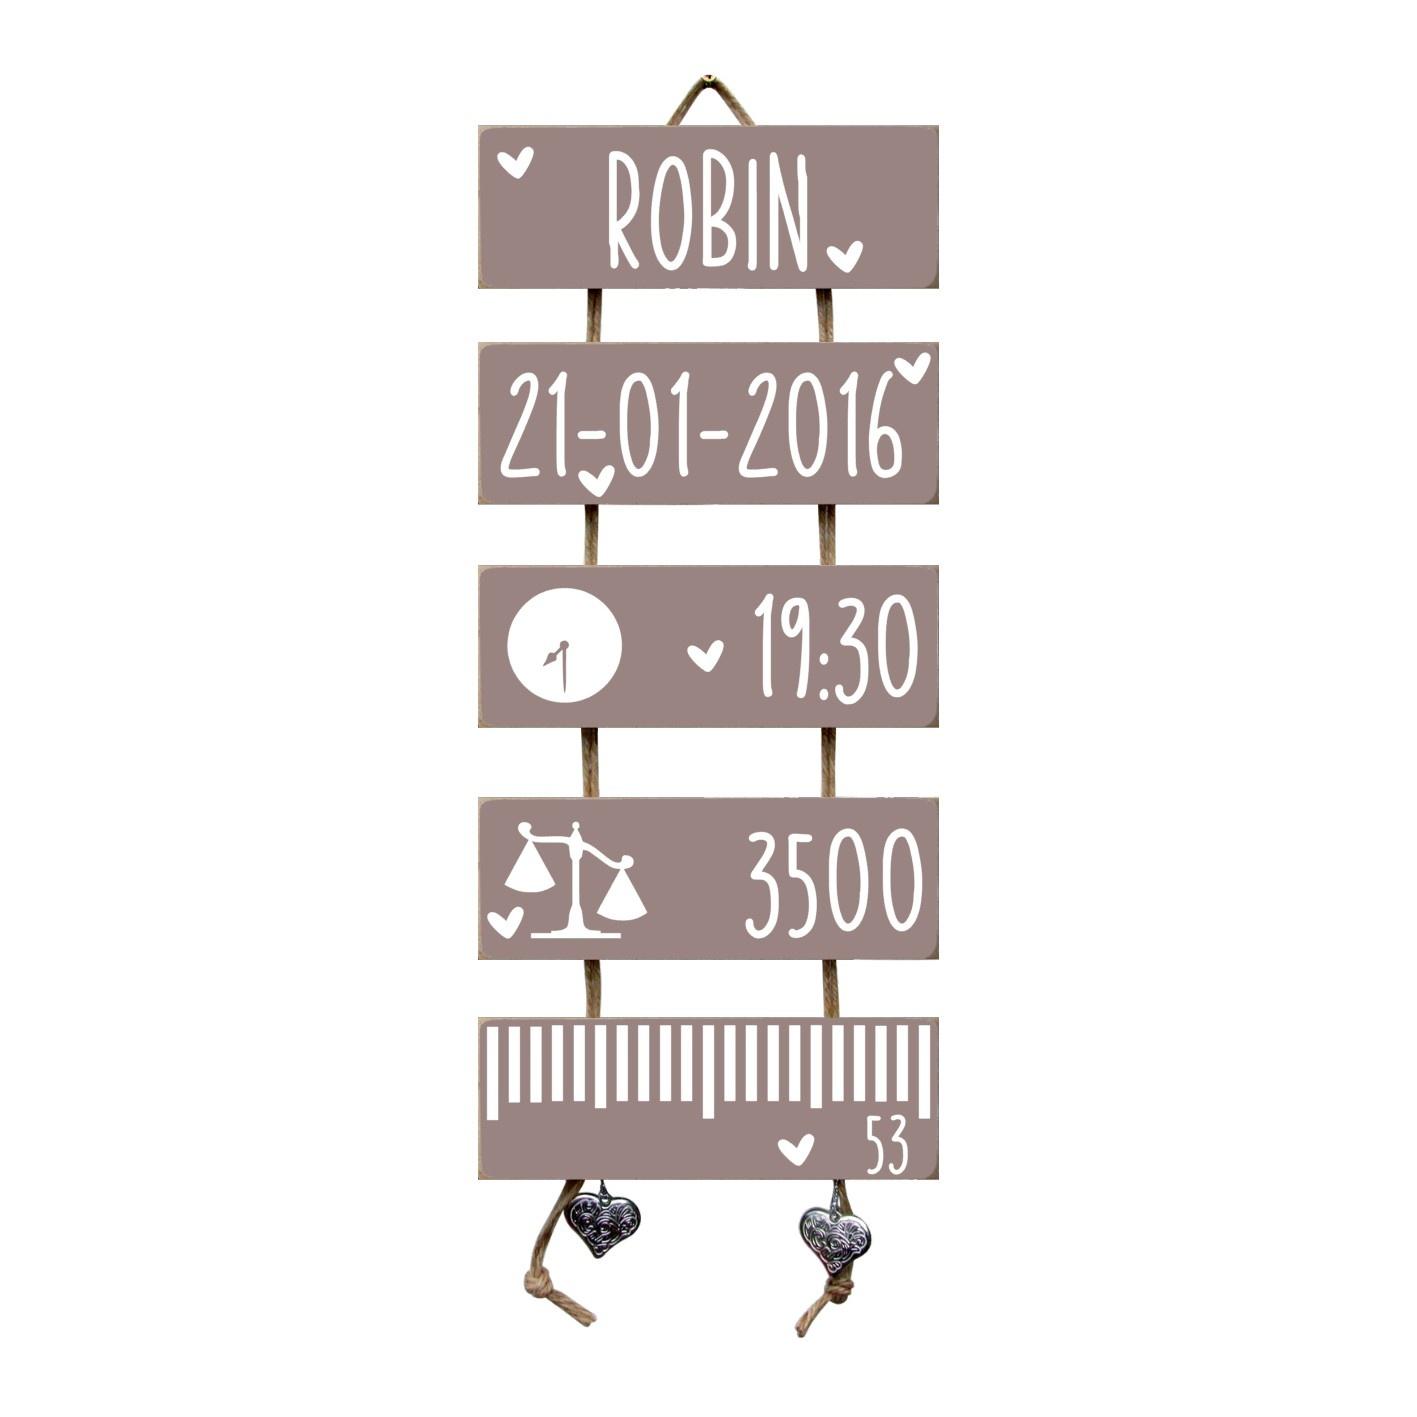 Kraamcadeau Geboorteladder Robin Heart Wood flexa